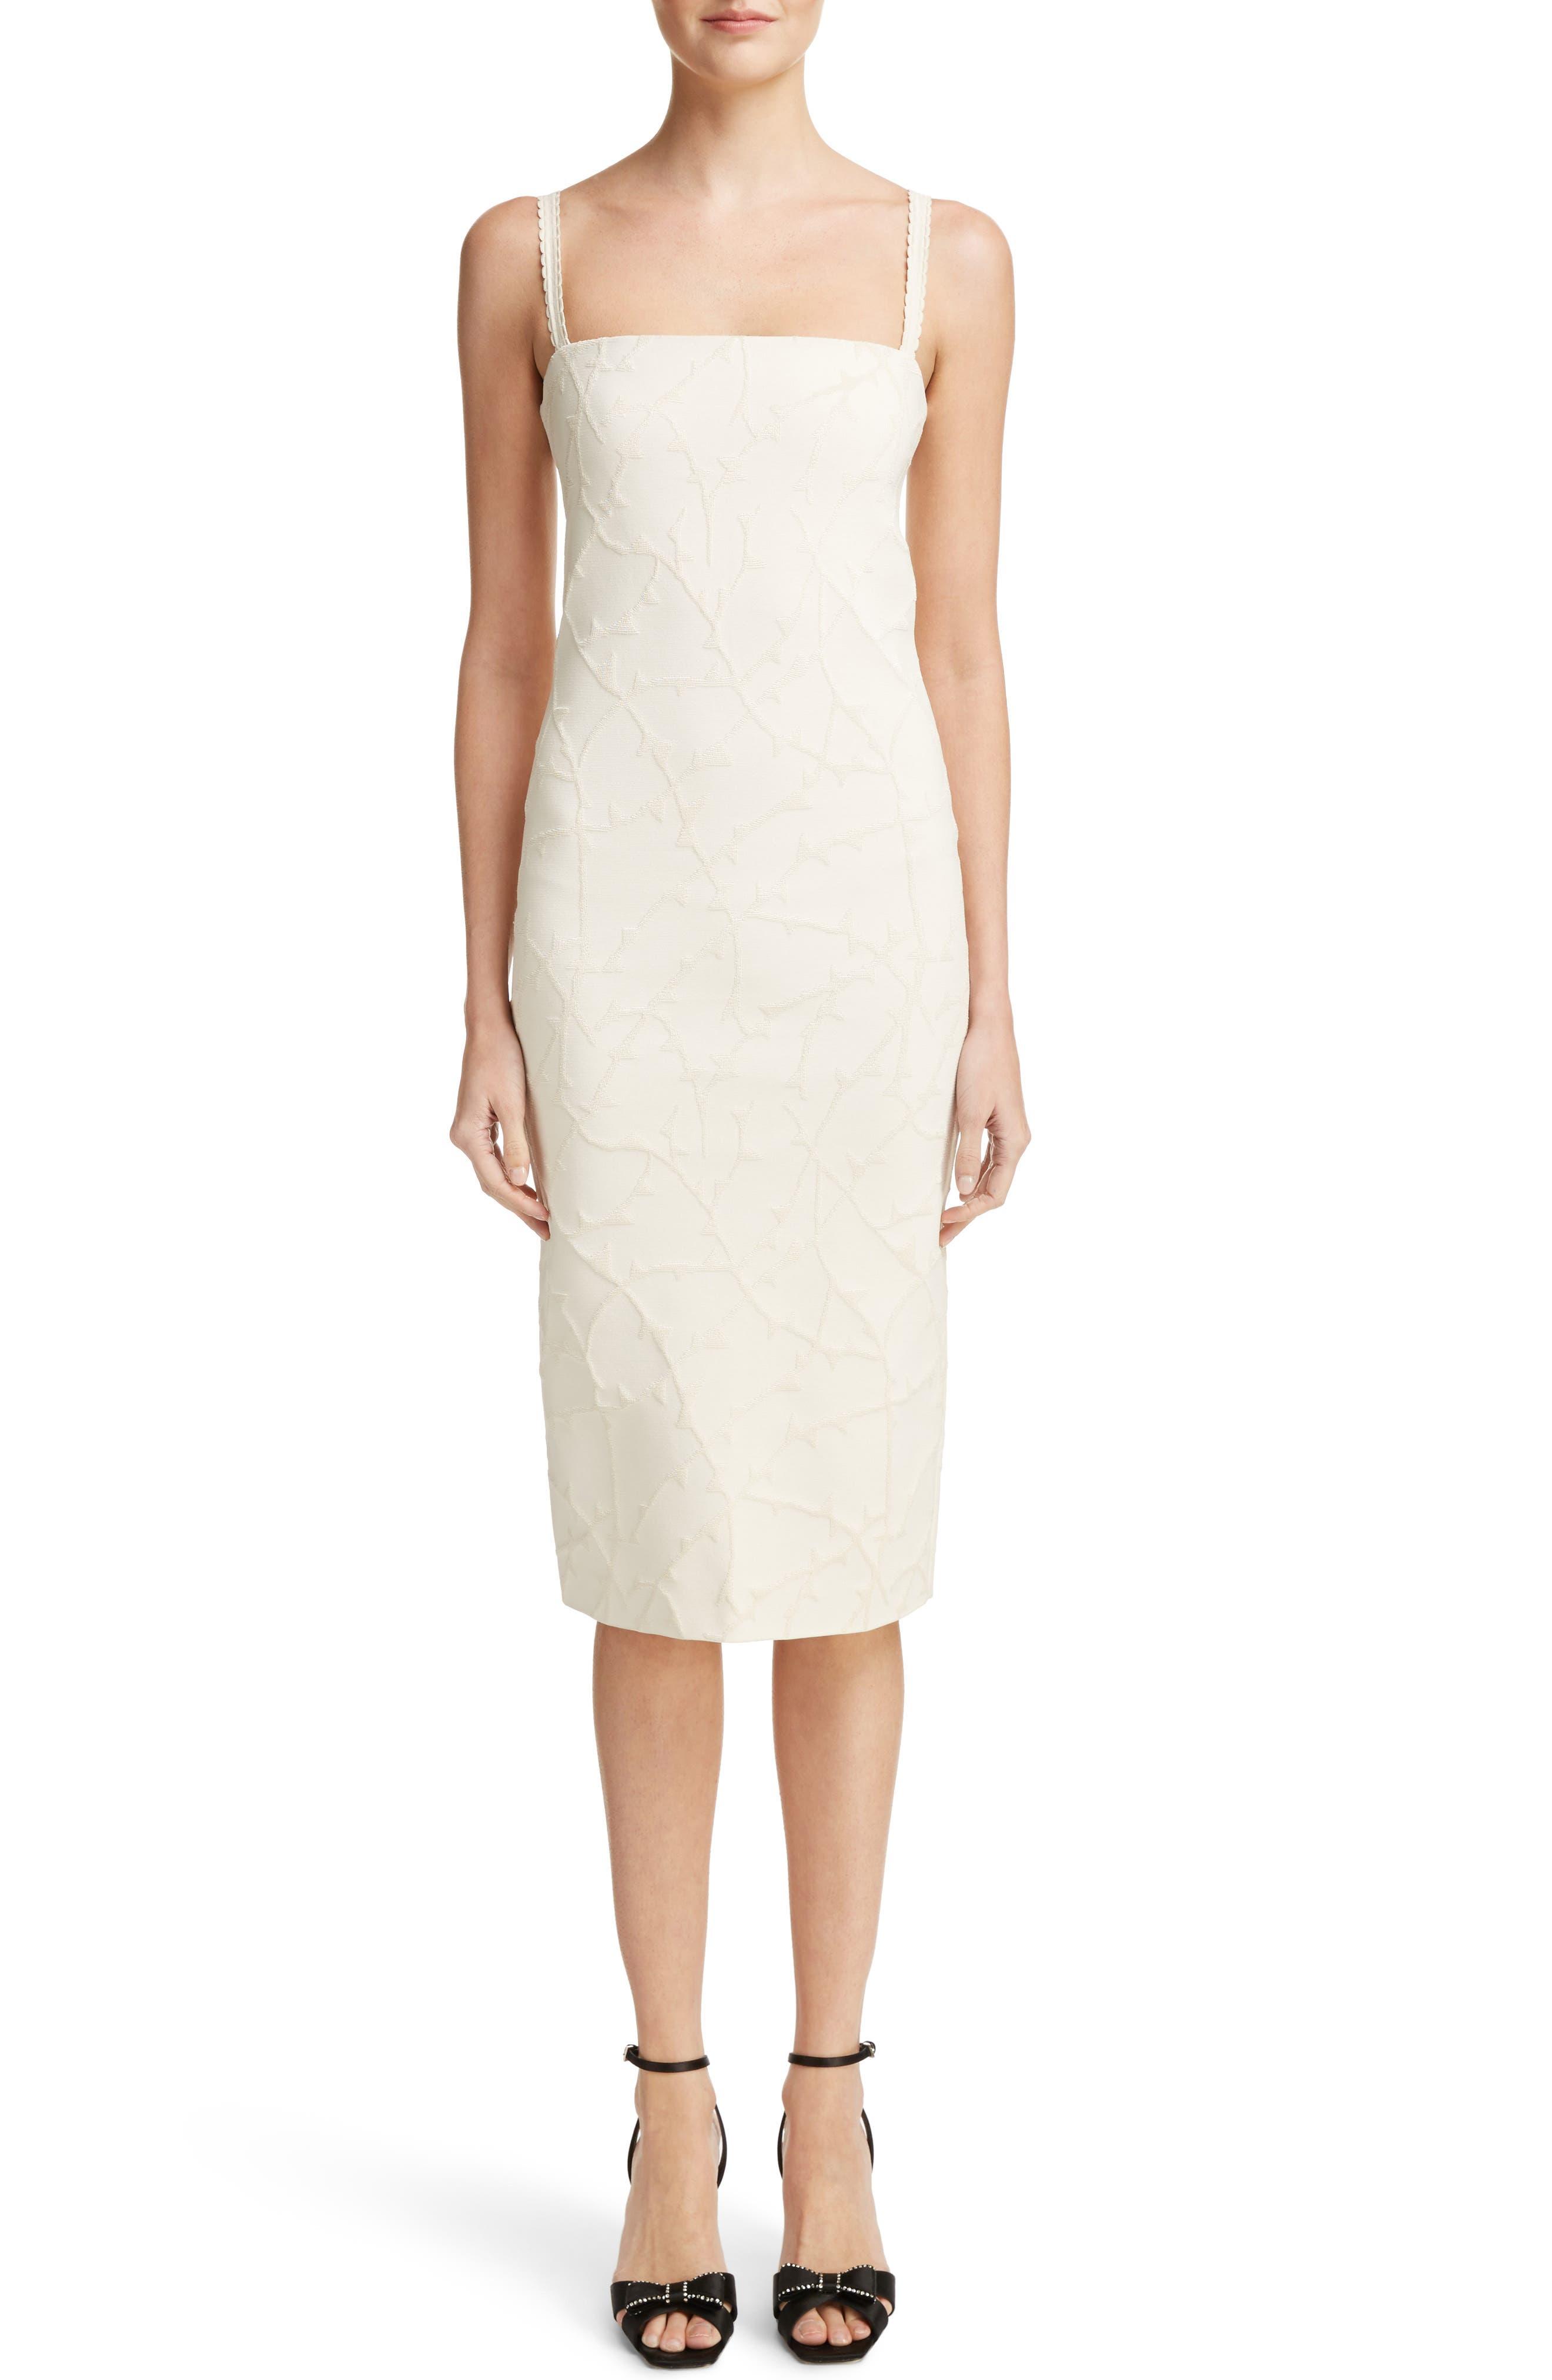 Loewe Jacquard Knit Dress